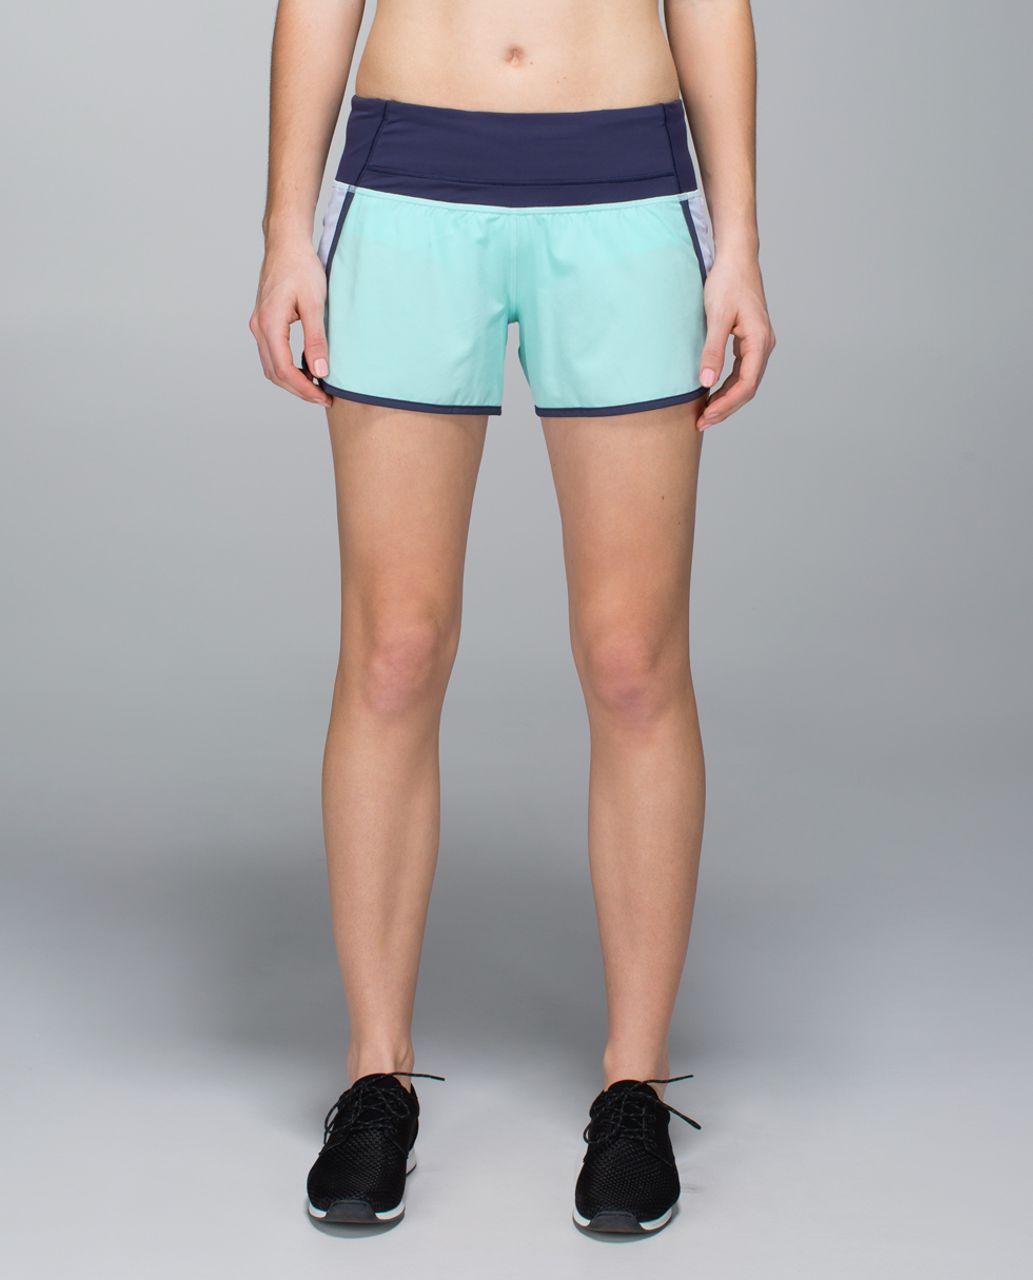 Lululemon Run Times Short *4-way stretch - Aquamarine / Cool Breeze / Cadet Blue